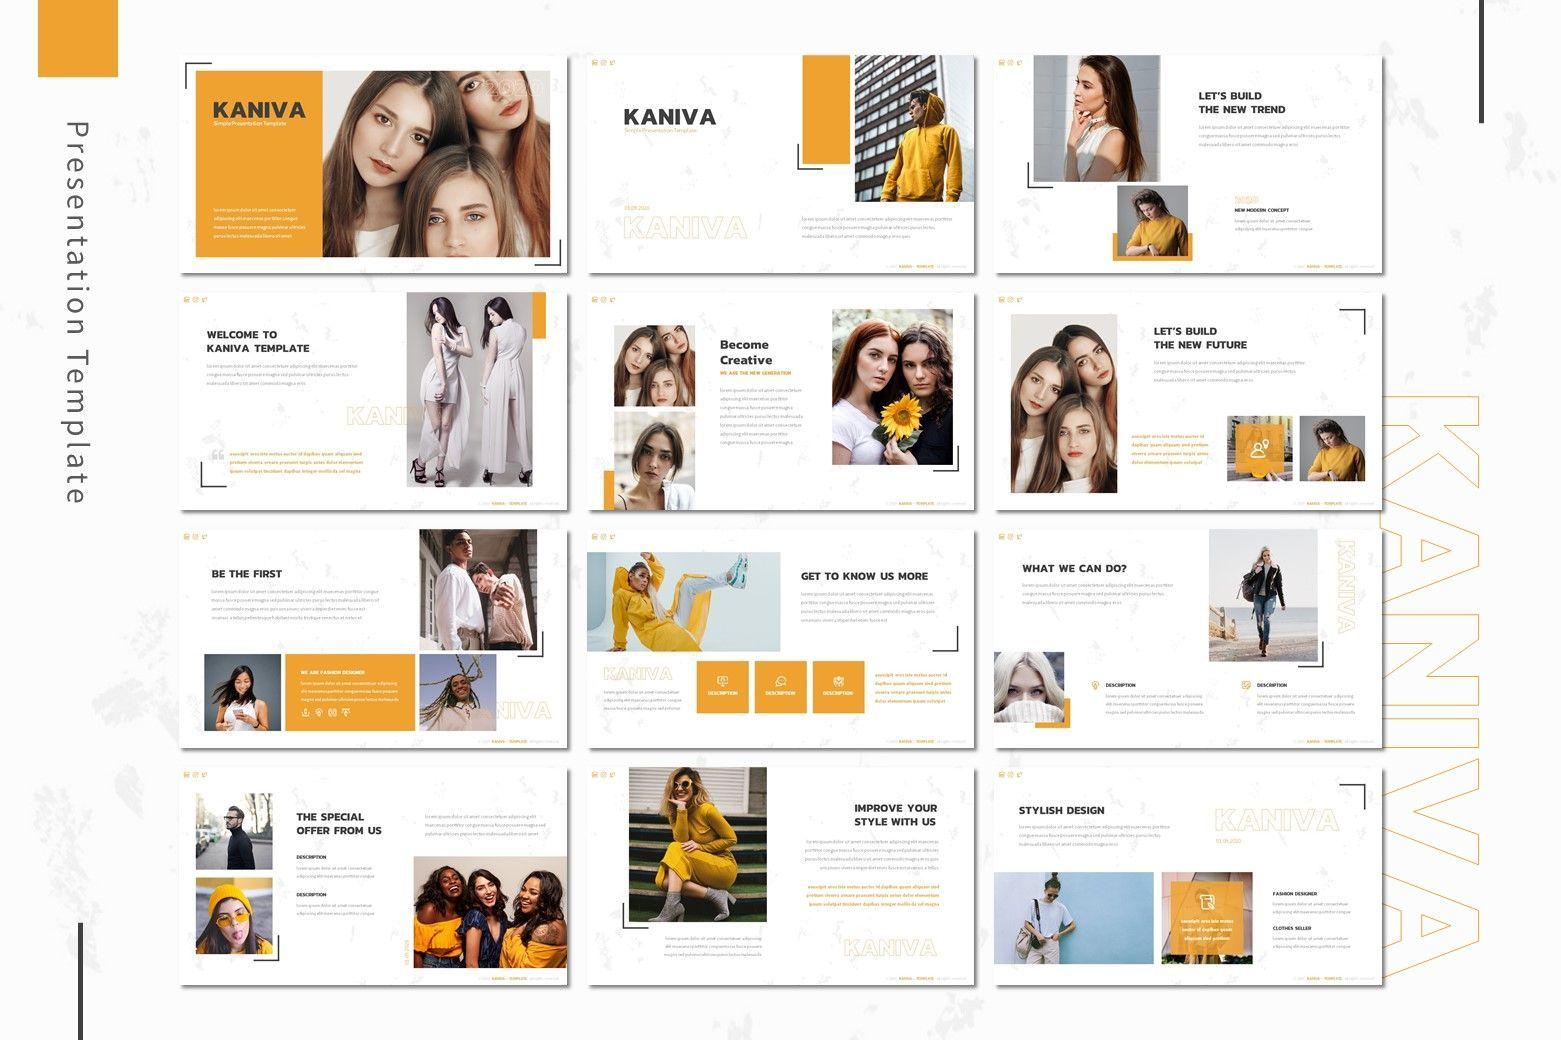 Kaniva - Powerpoint Template, Slide 2, 08001, Presentation Templates — PoweredTemplate.com